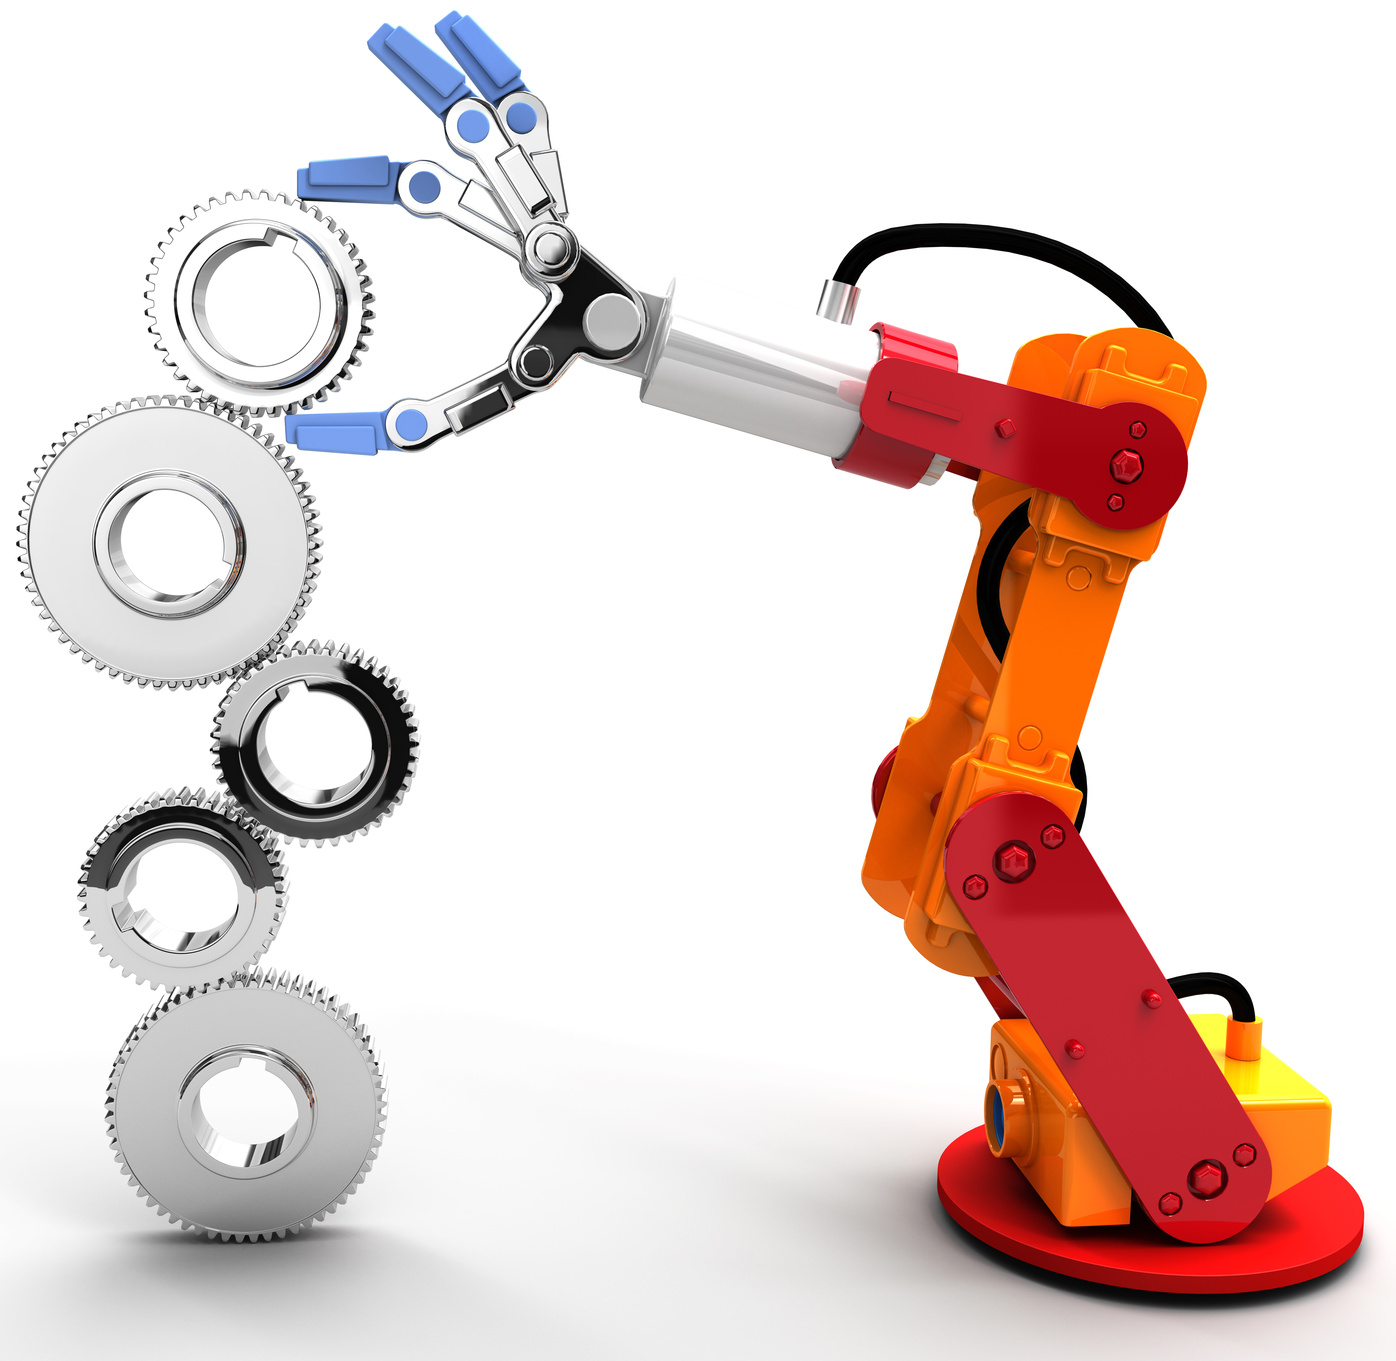 Fotolia_67137547_Robot Arm